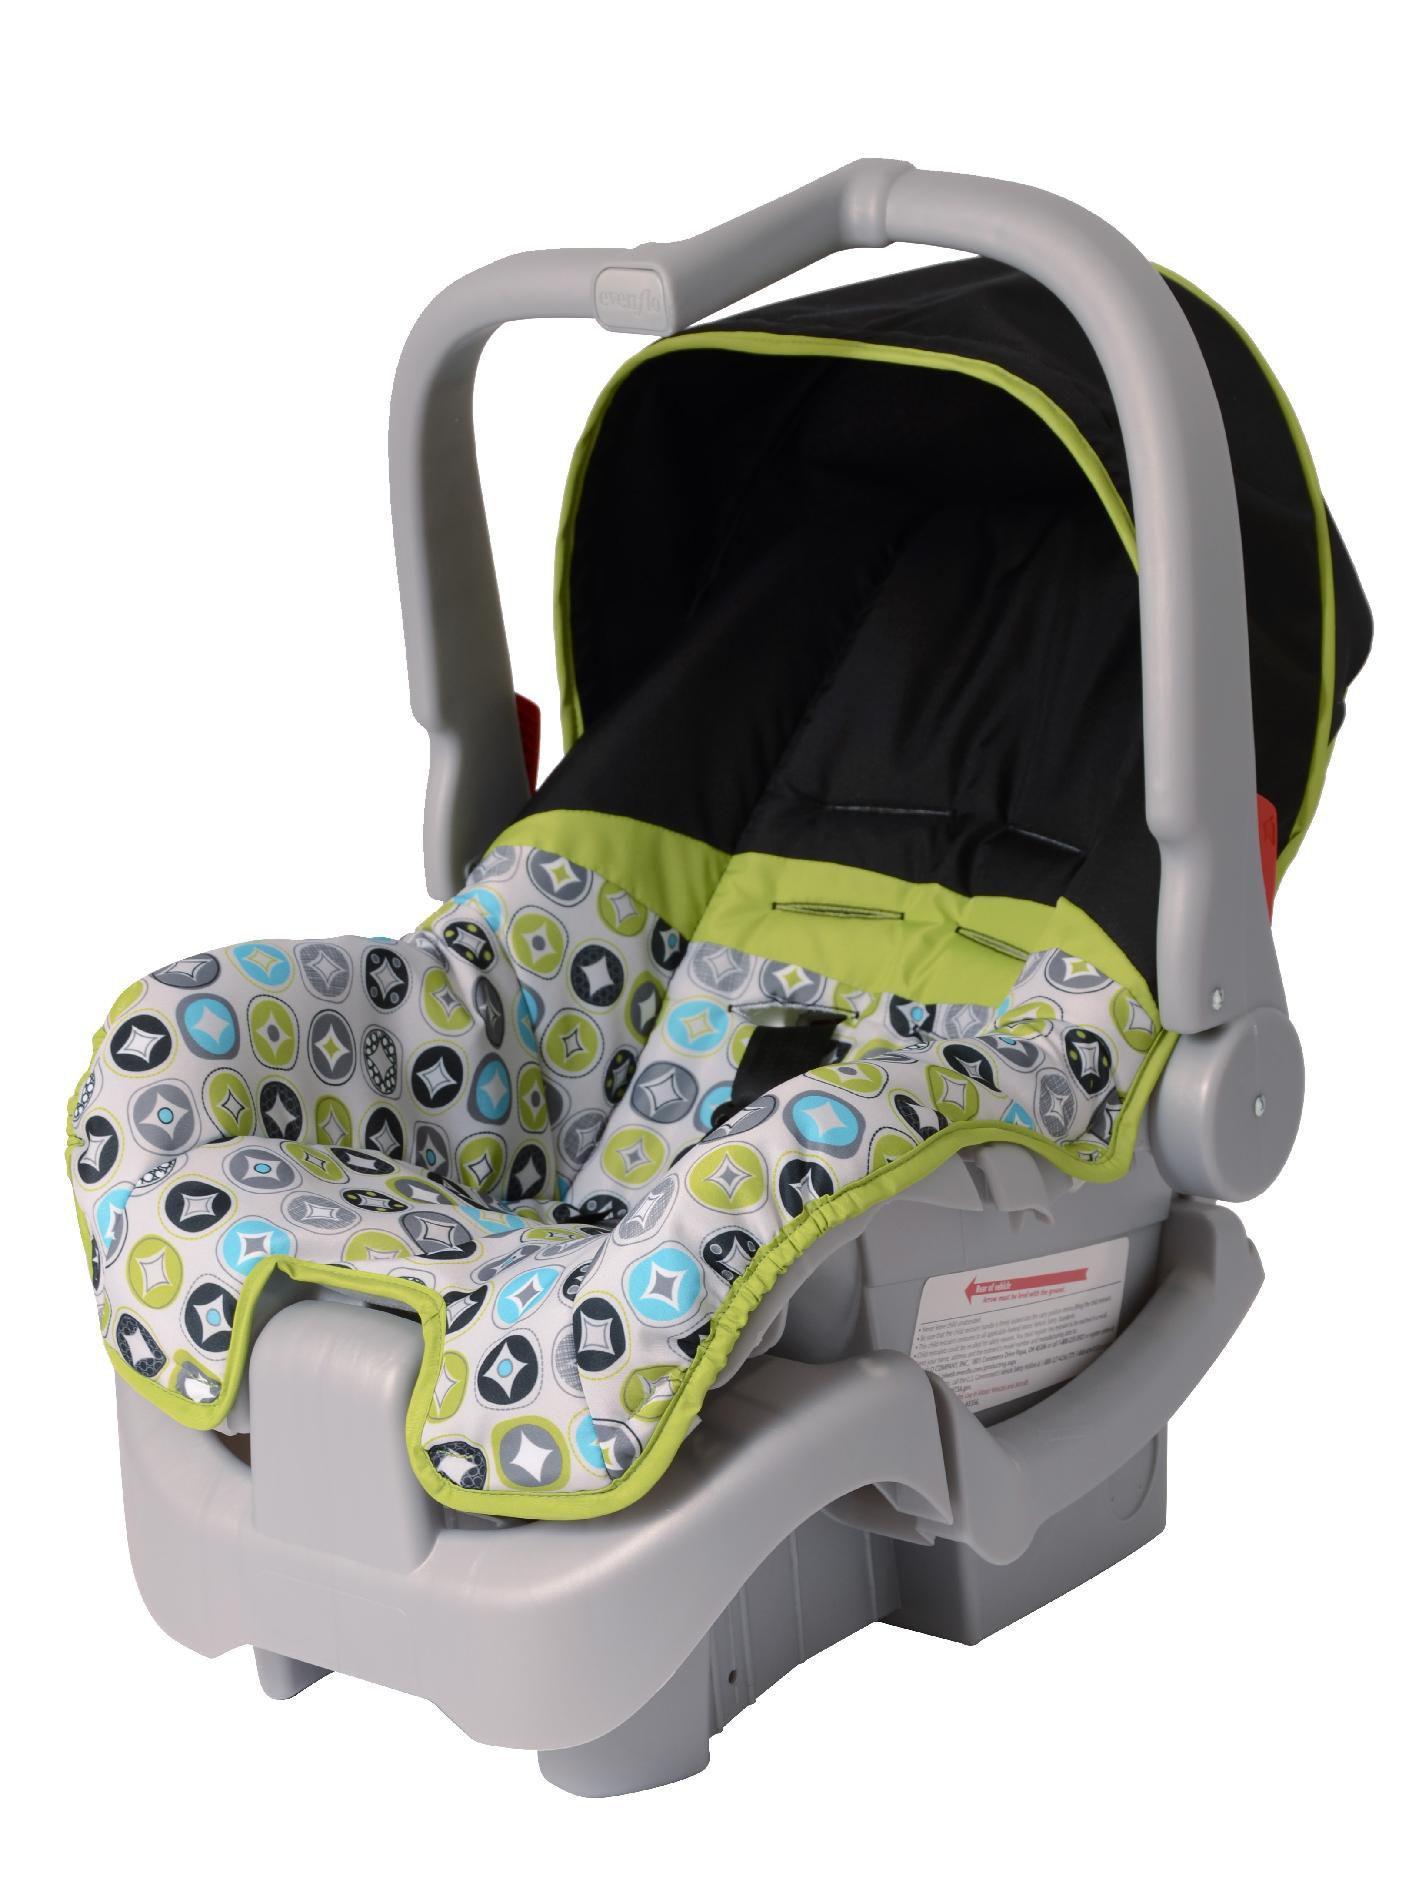 Evenflo discovery car seat manual